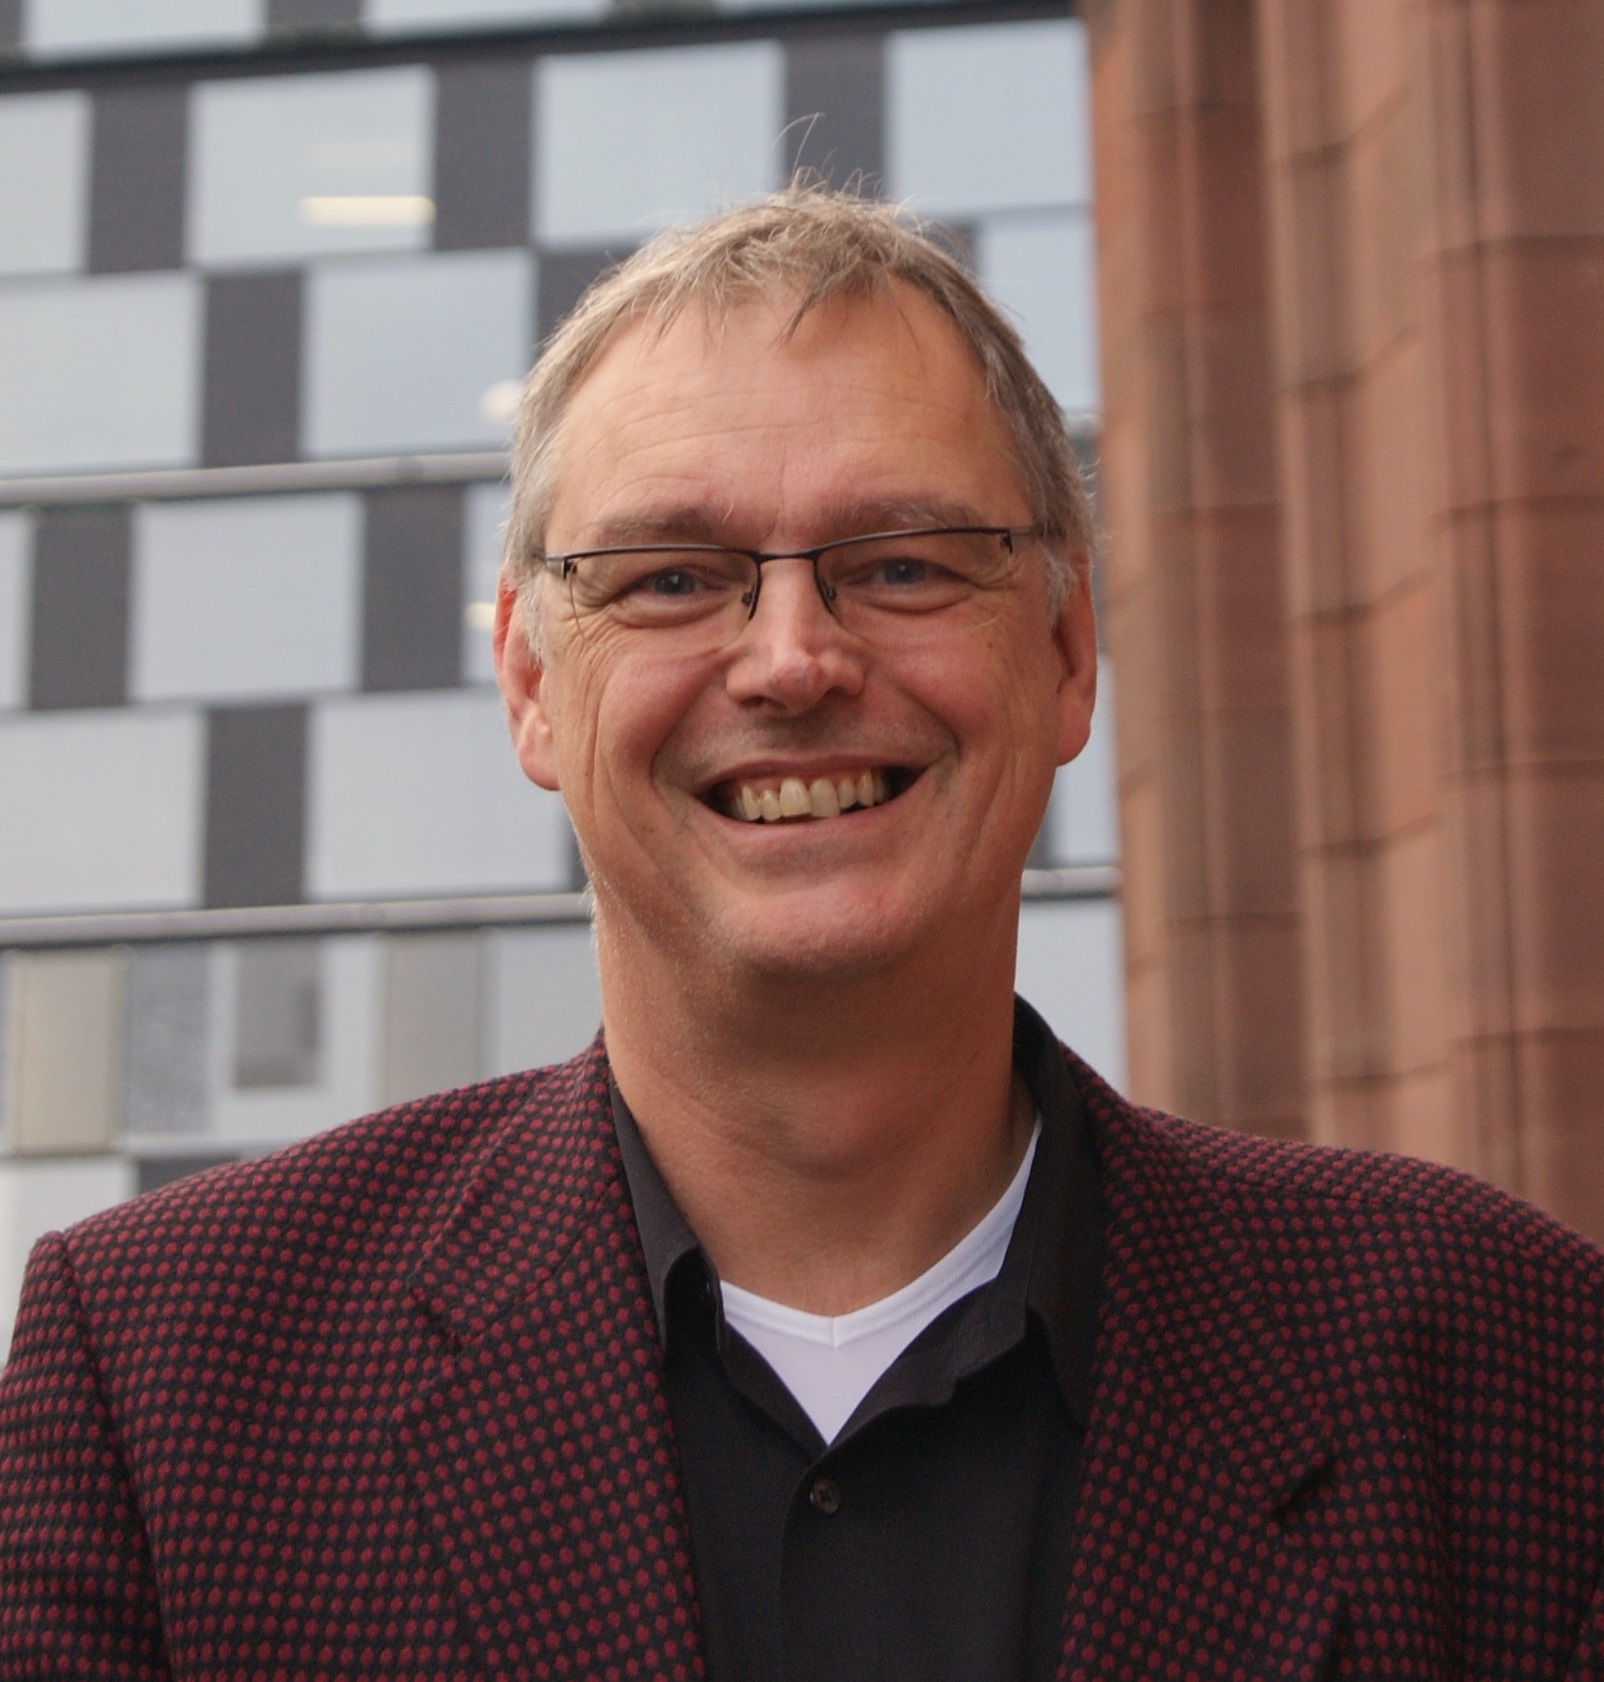 foto prof. bernhard neumaerker